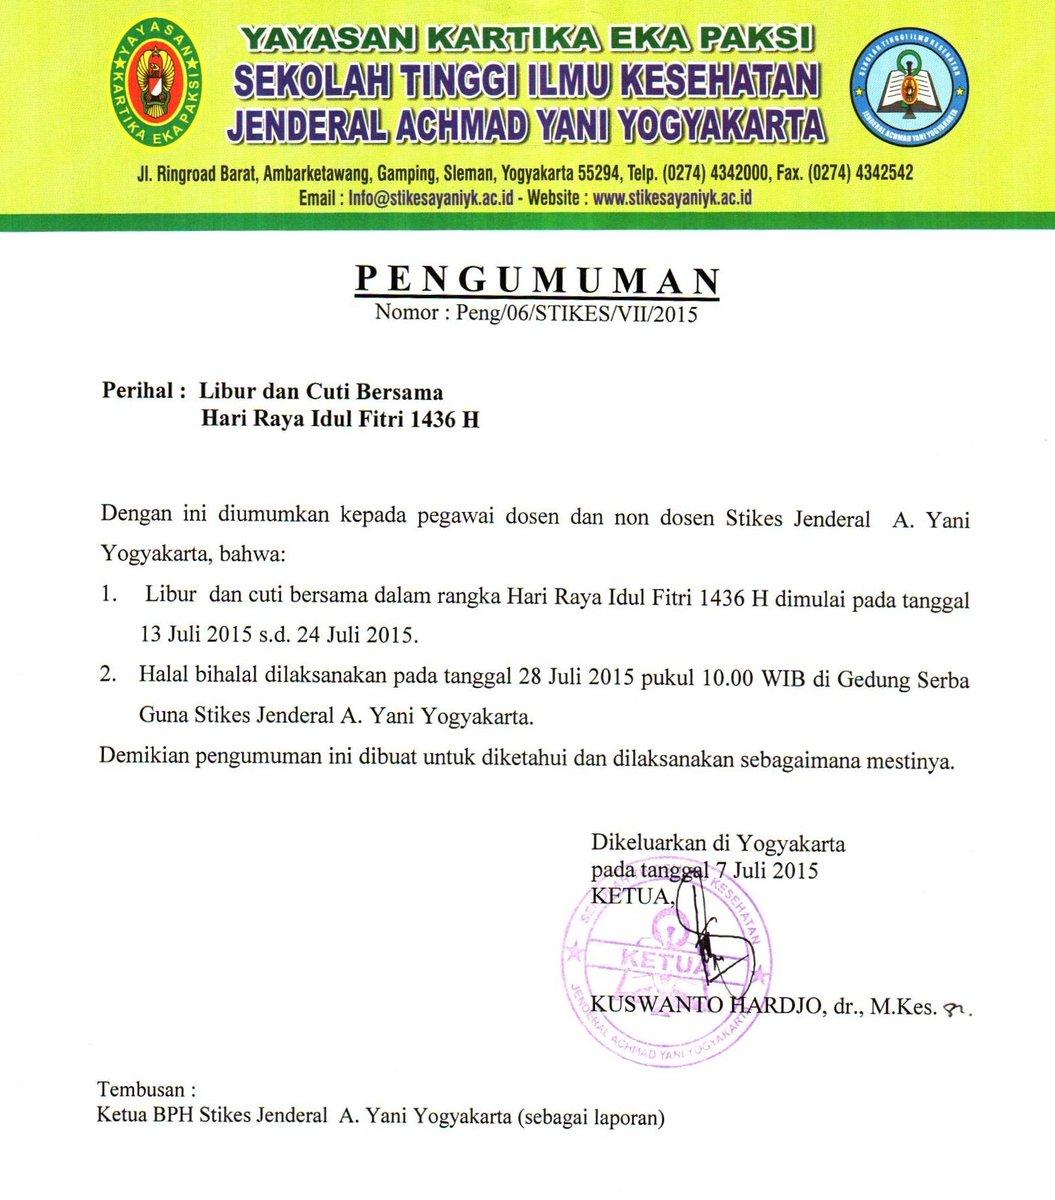 Unjani Yogyakarta on Twitter: